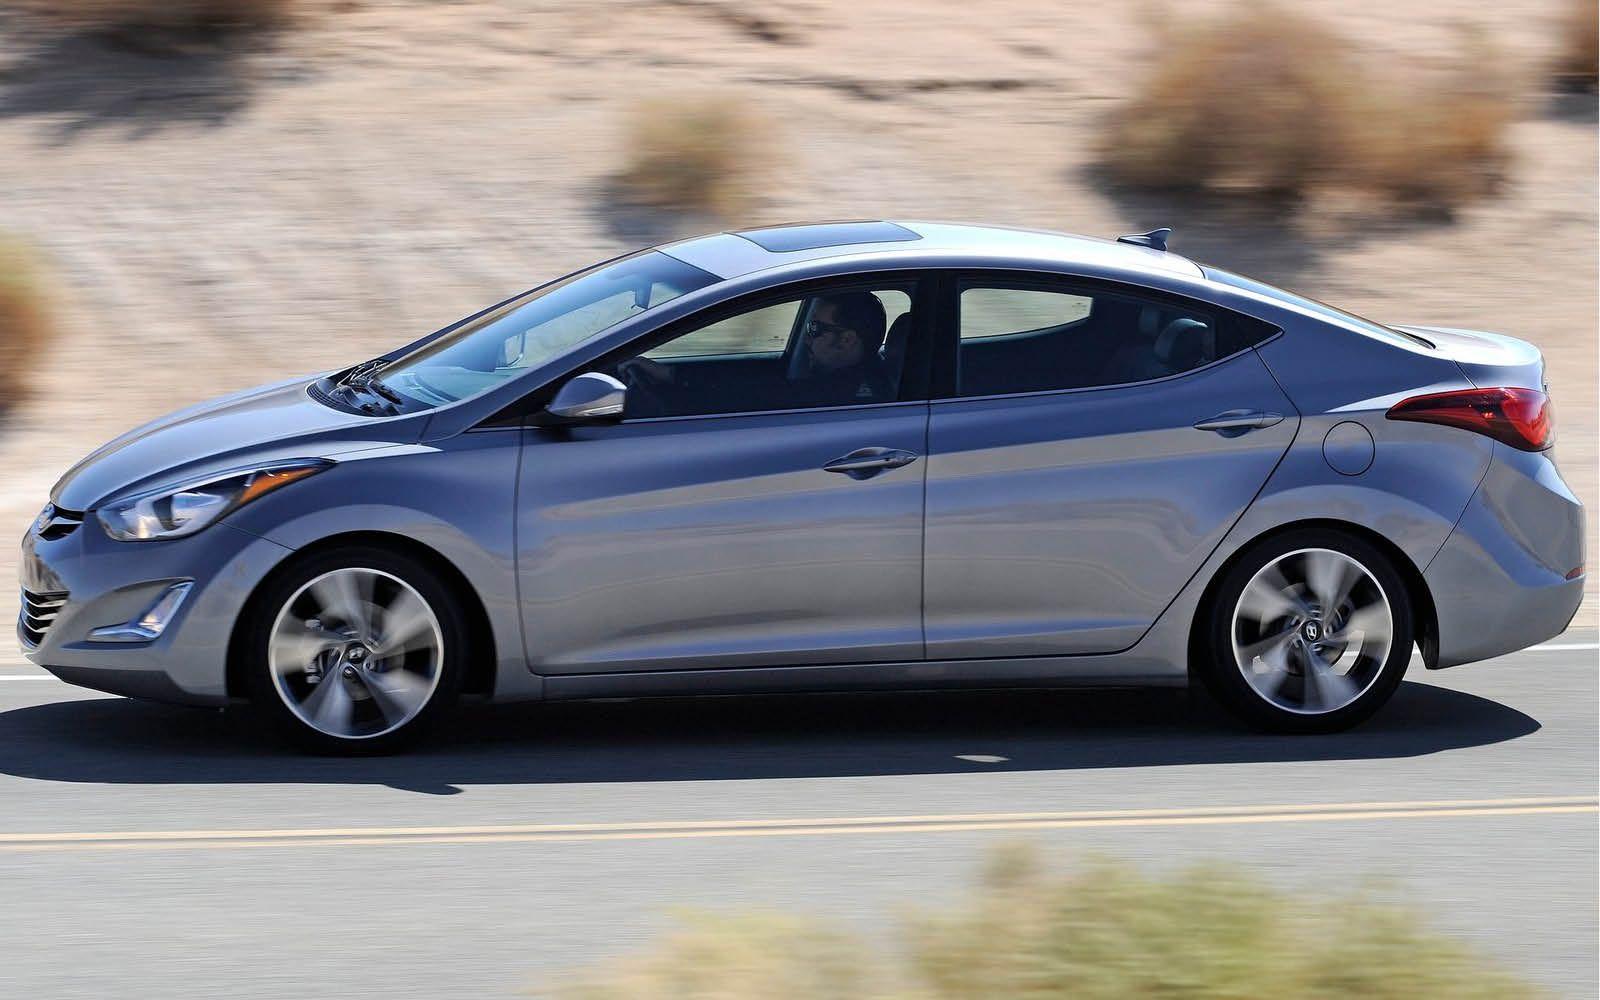 Pin On Hyundai Automotive Design